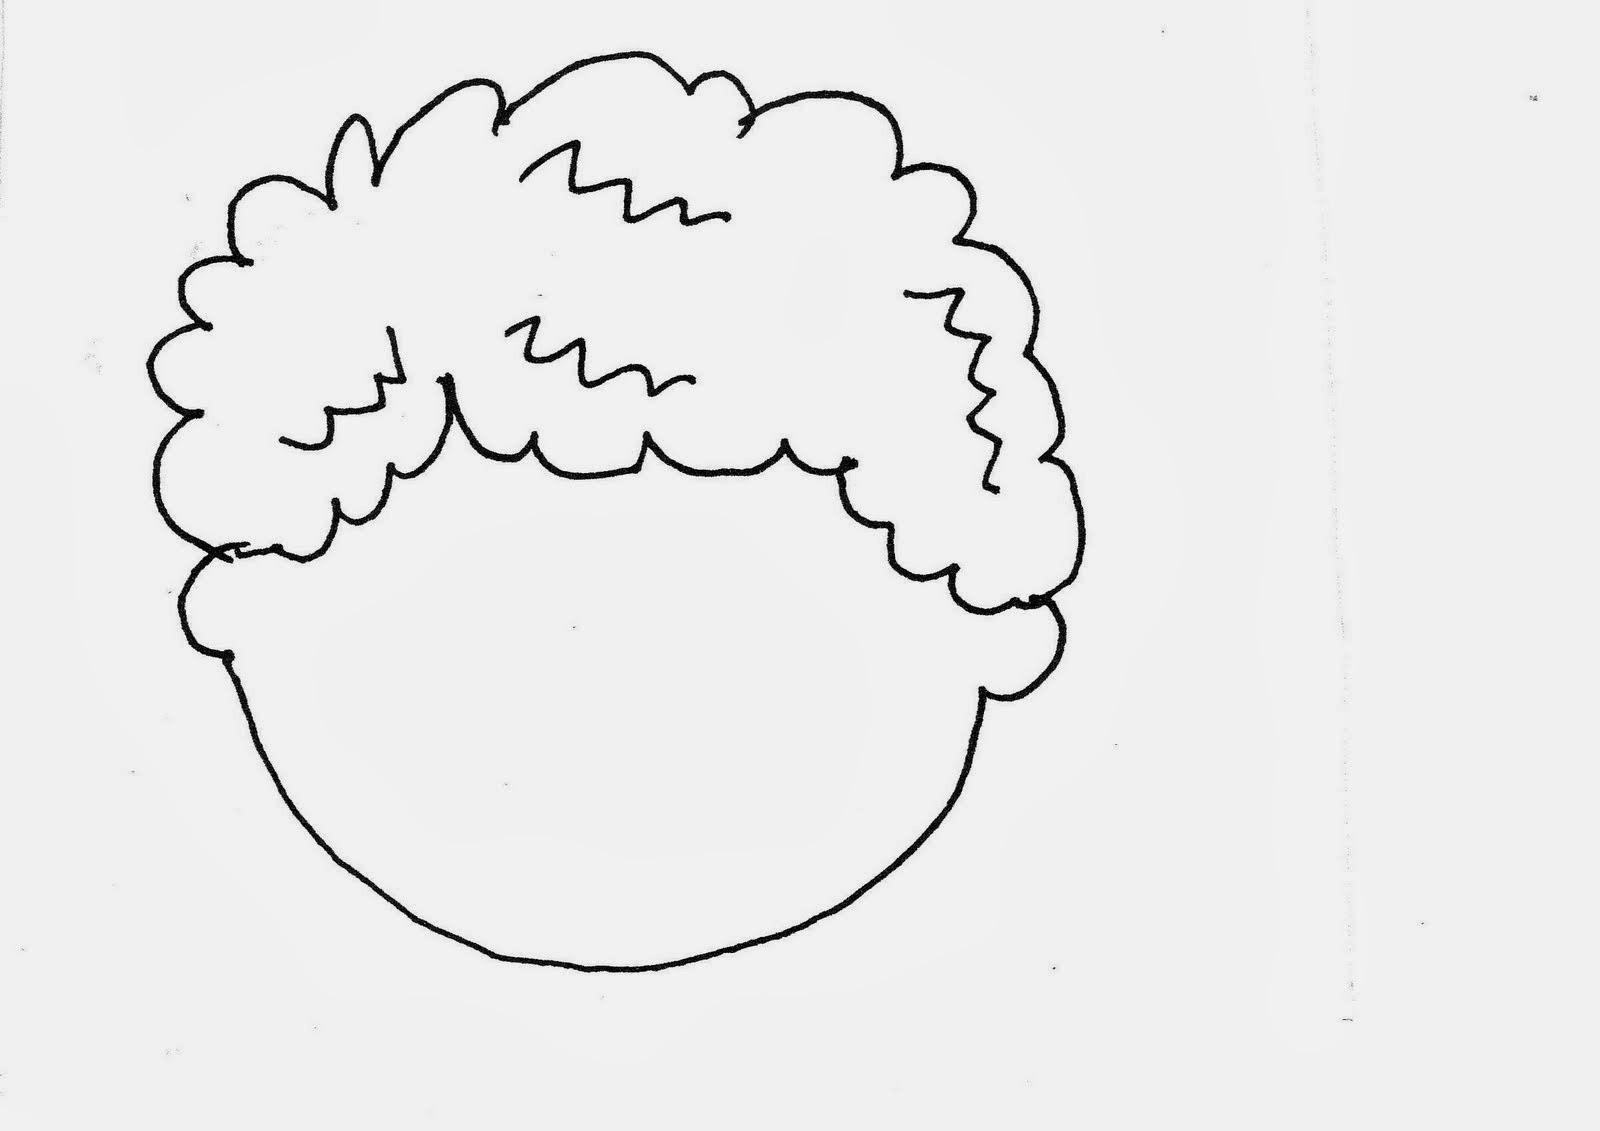 Dibujos De Aplicacio De Partes De La Cara: Atividades De Recortar E Colar #1